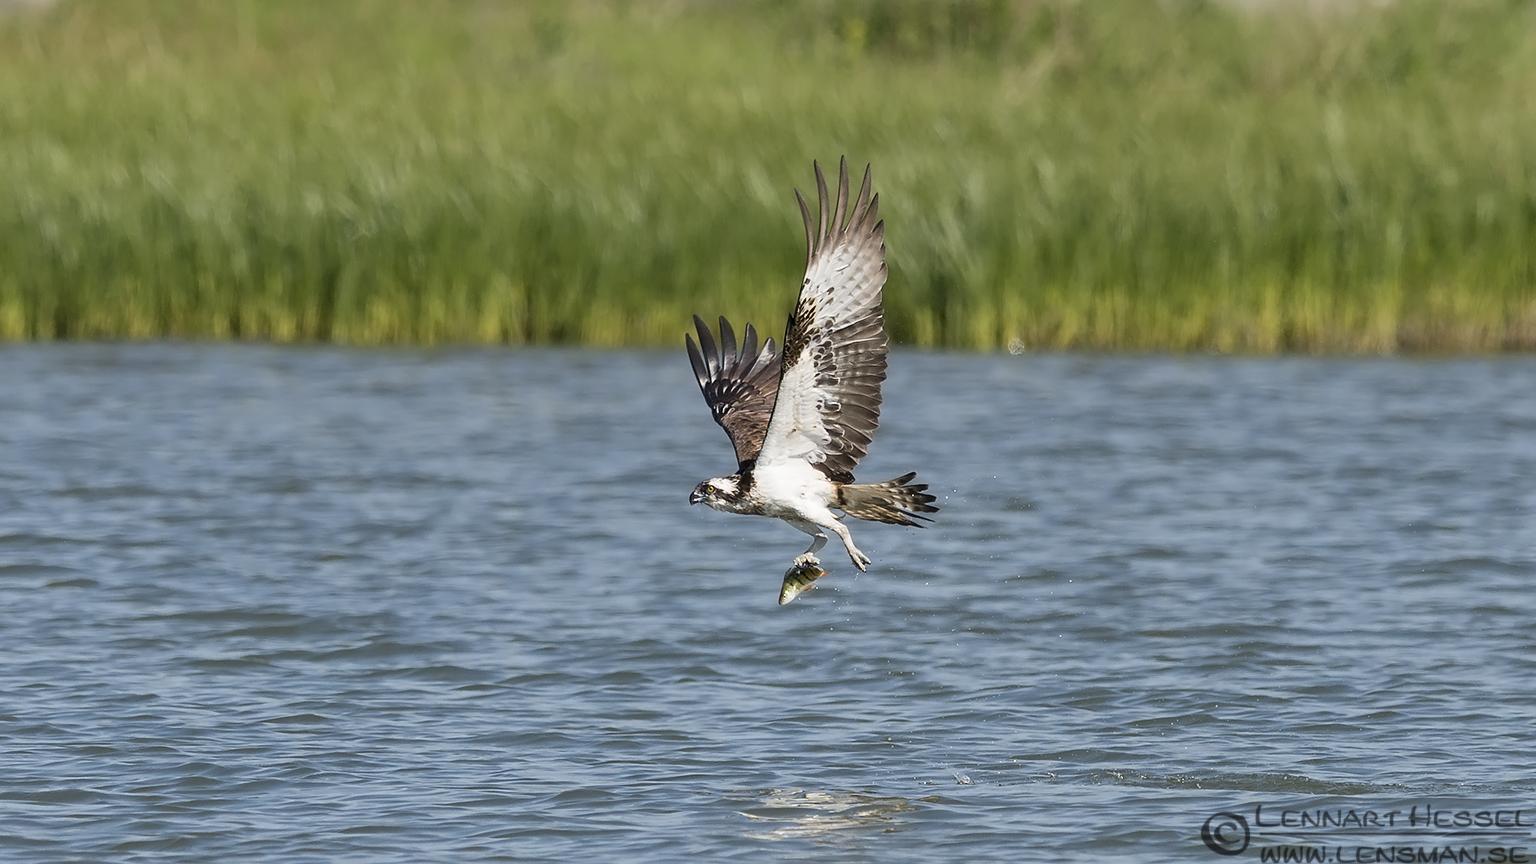 Osprey with the catch